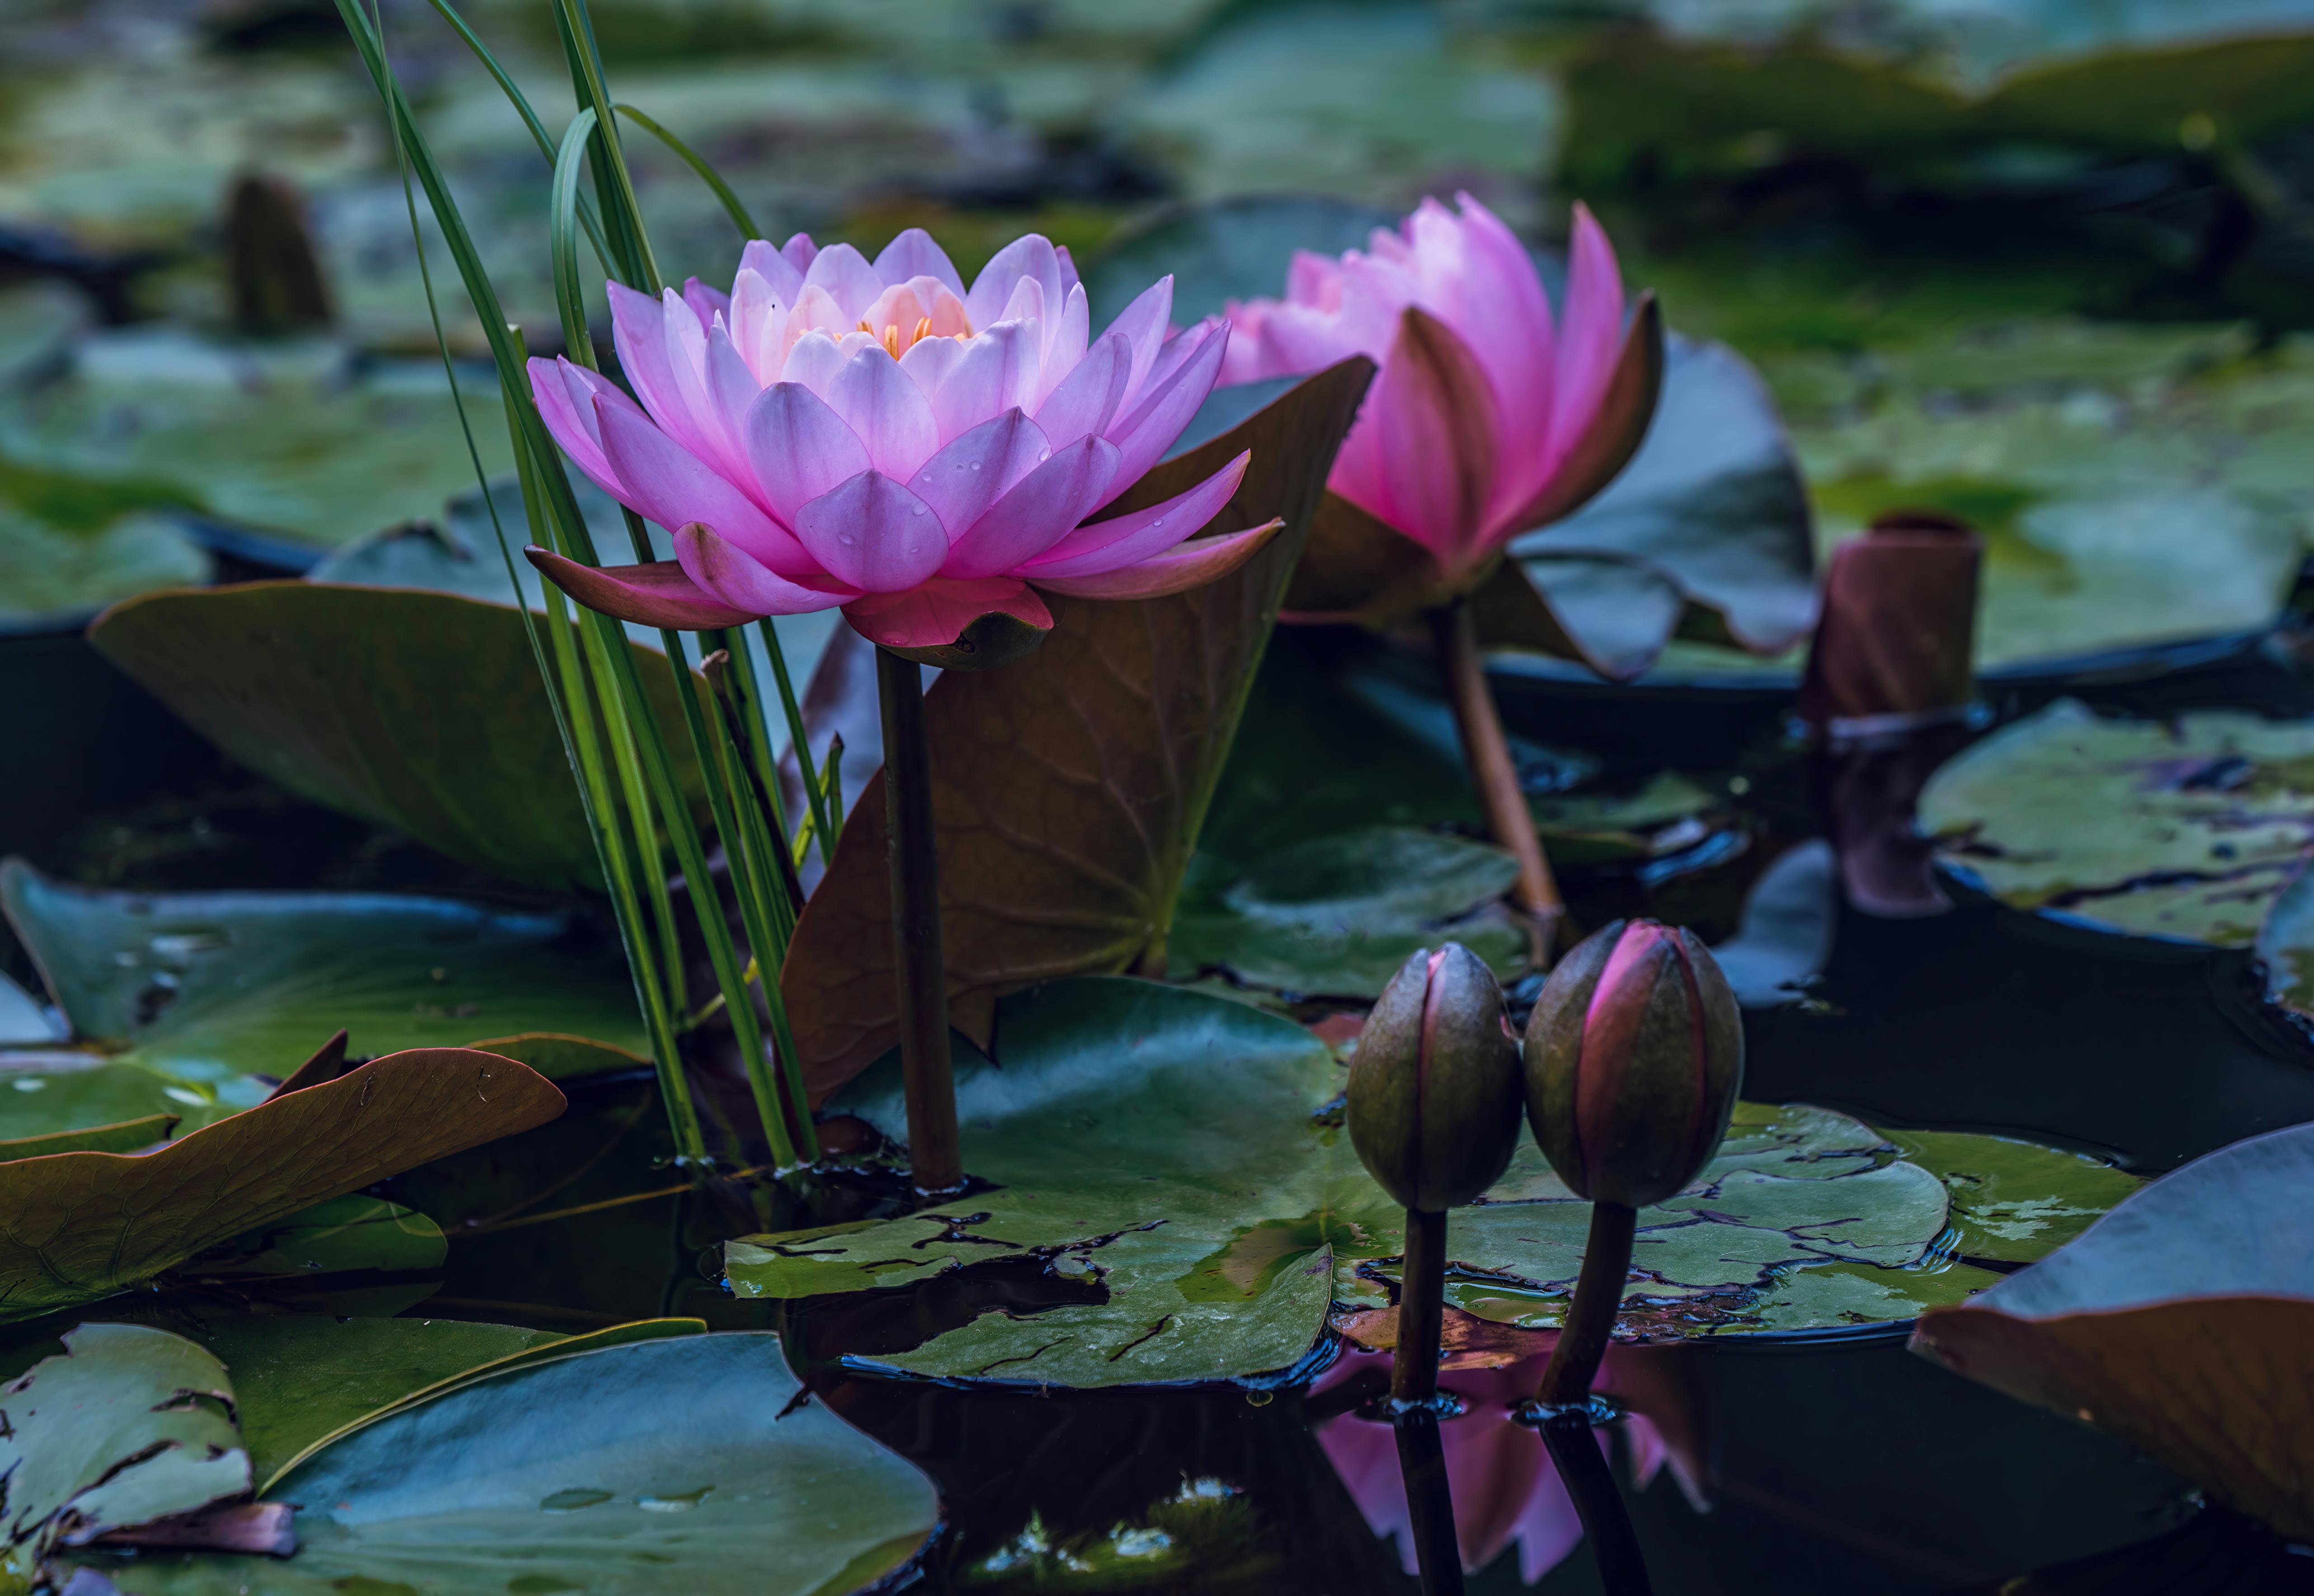 water lilies in pond 4k 1630616437 - Water Lilies In Pond 4k - Water Lilies In Pond wallpapers, Water Lilies In Pond 4k wallpaperes